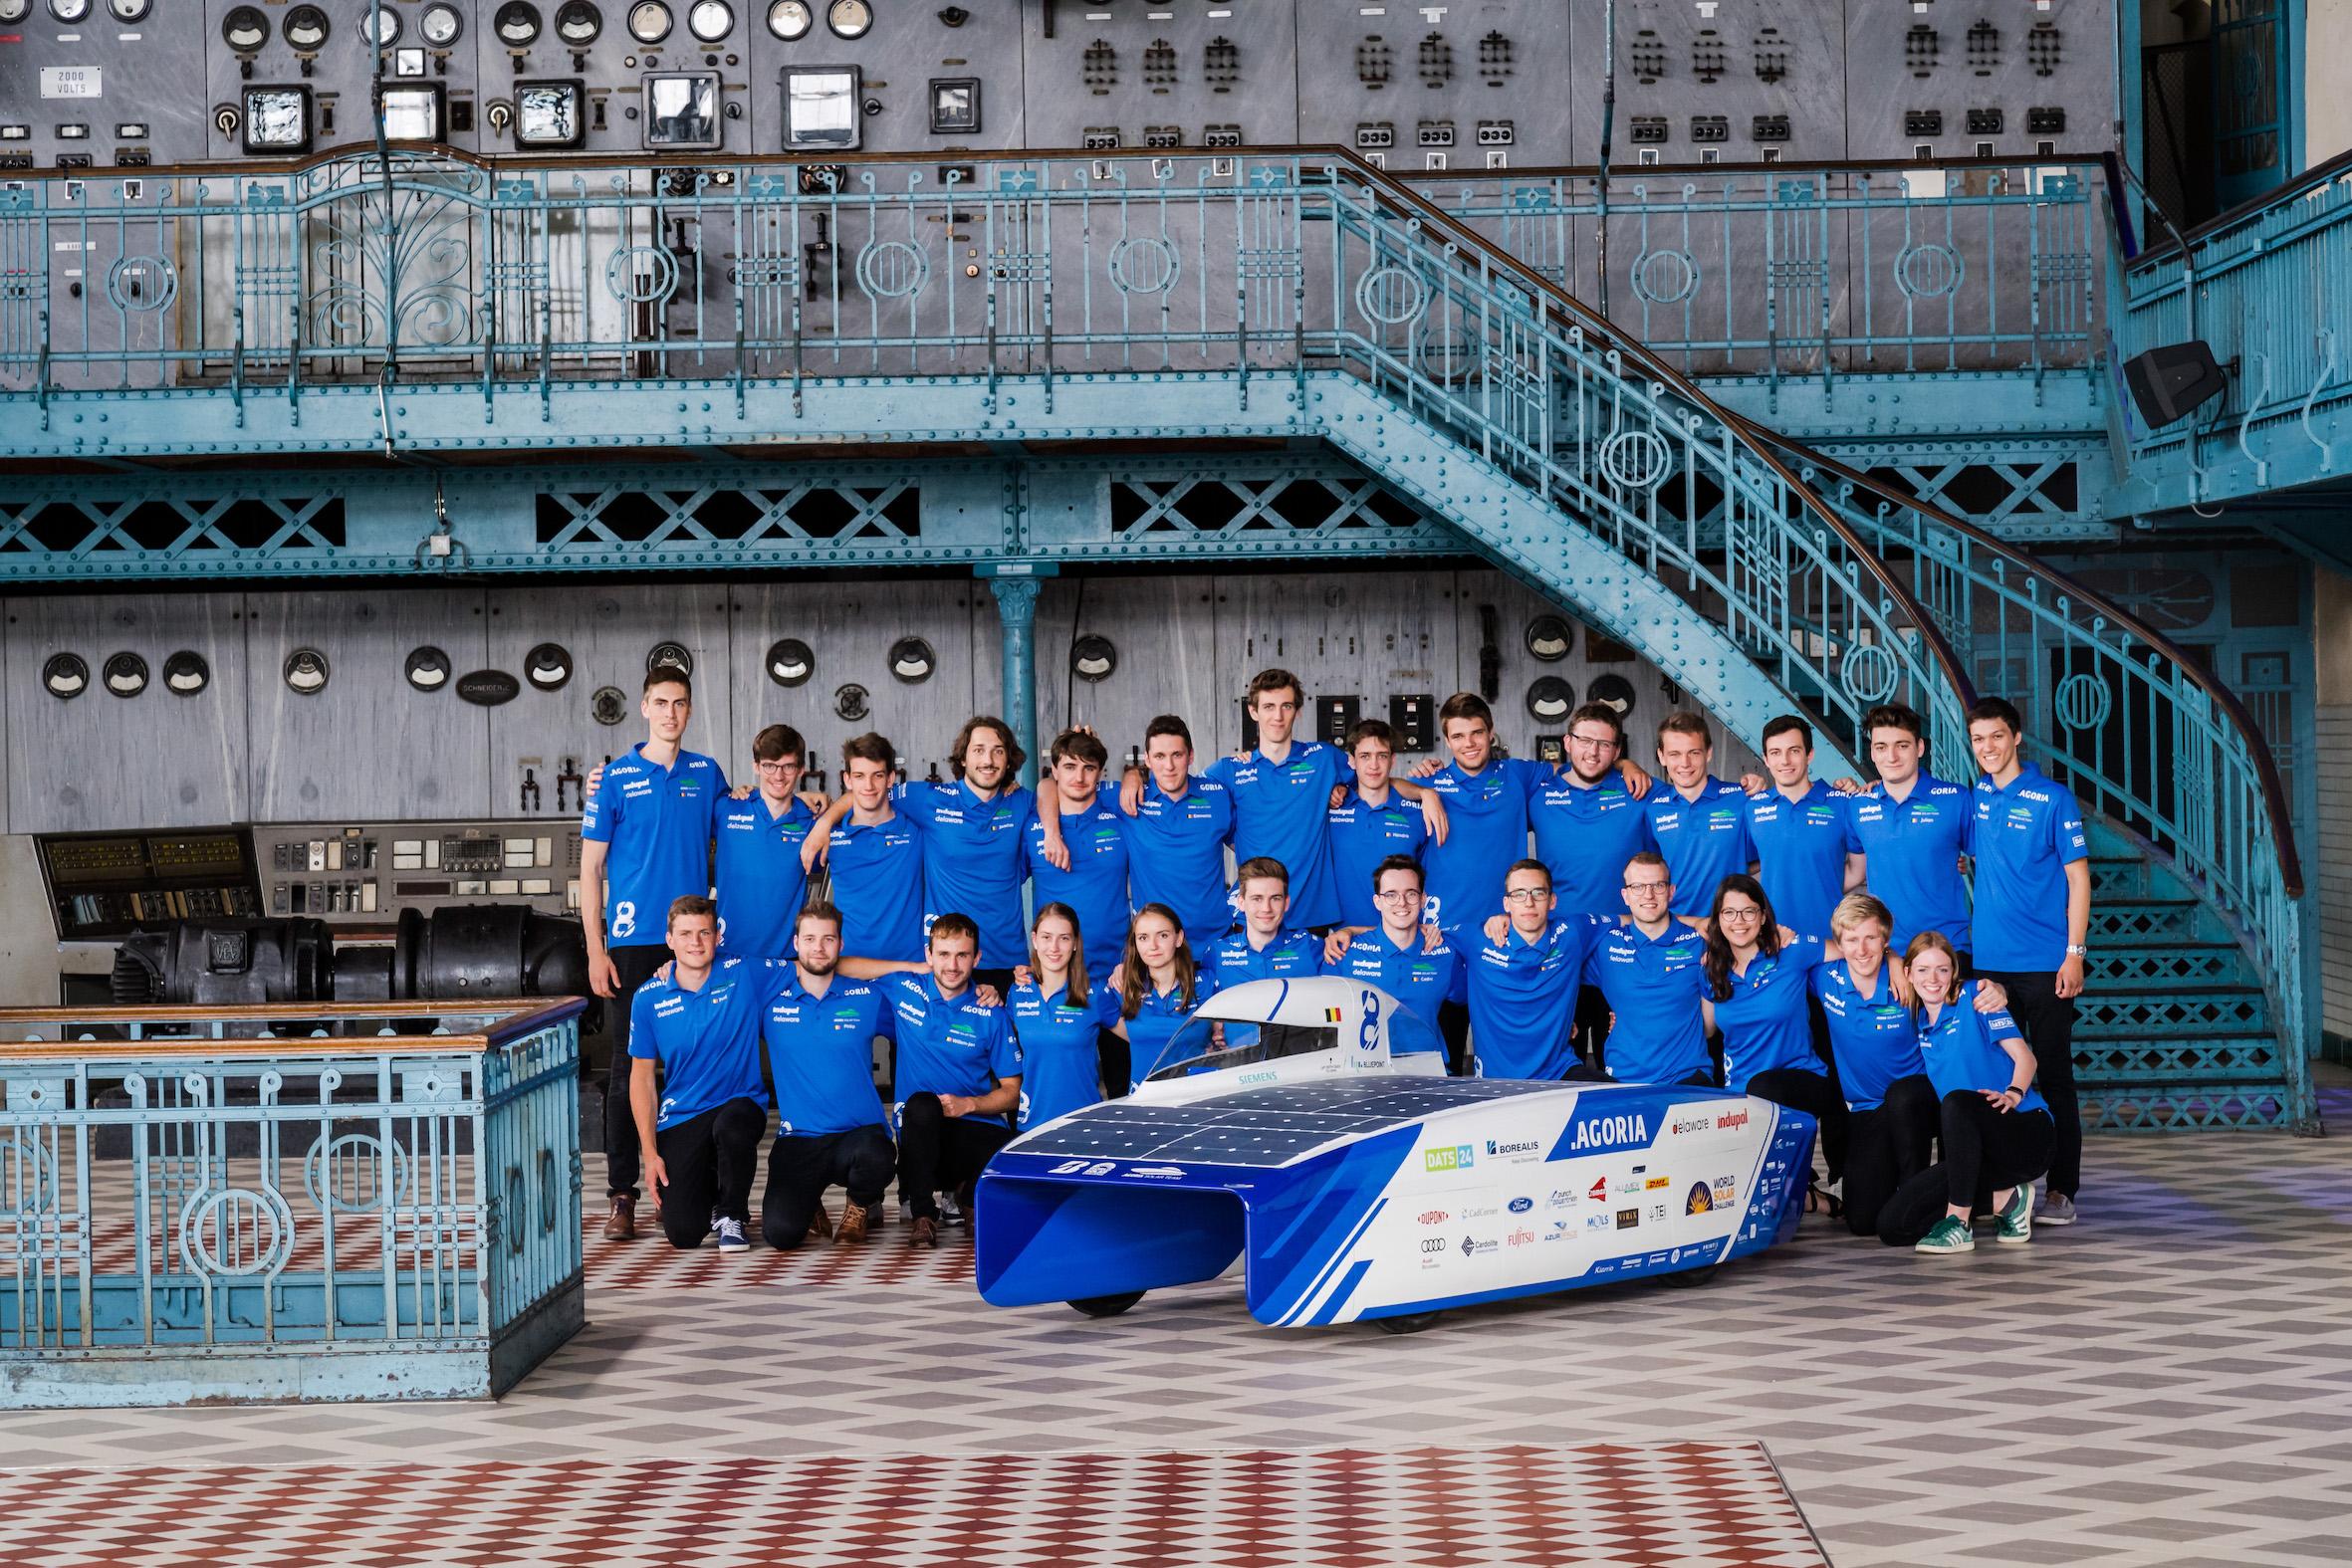 cx-agoria-solar-team-unveils-its-entry-for-the-2019-bridgestone-world-solar-challenge